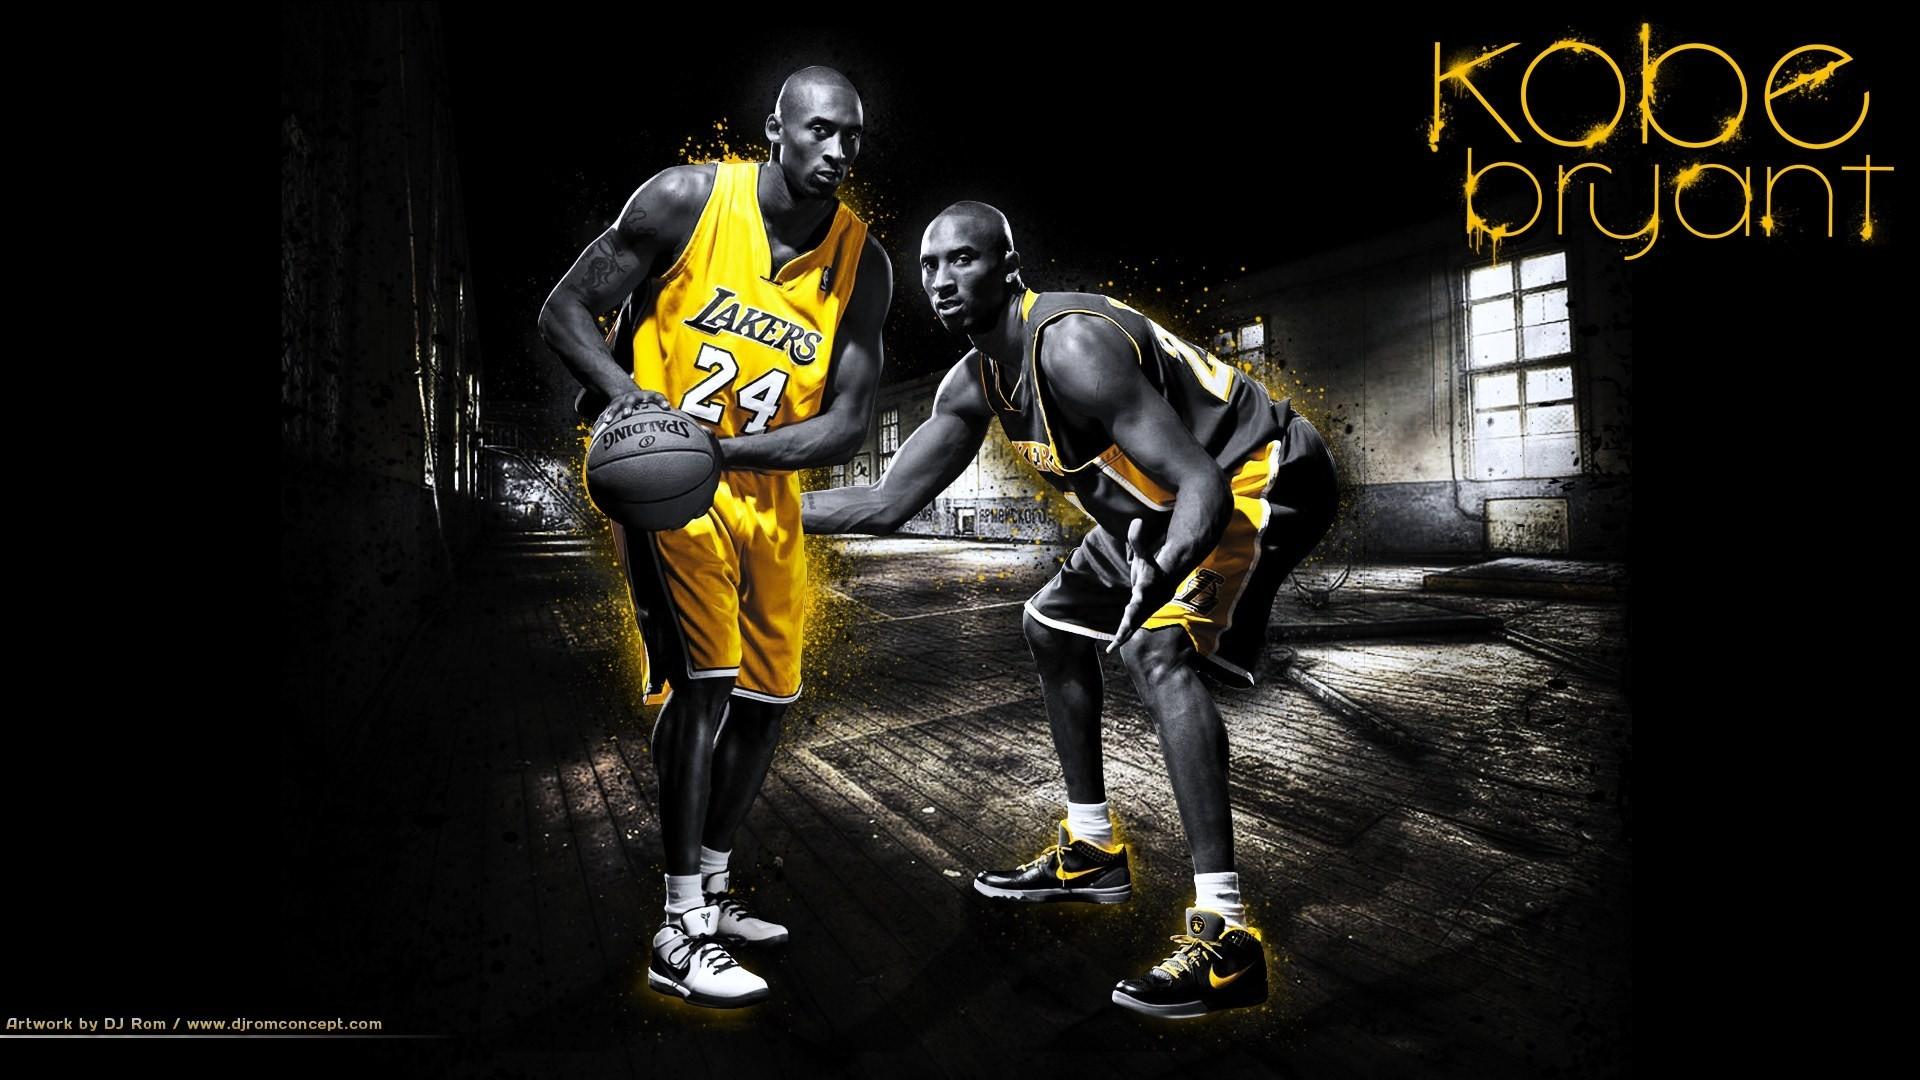 Fantastic Wallpaper High Quality Basketball - 614166  You Should Have_337819.jpg